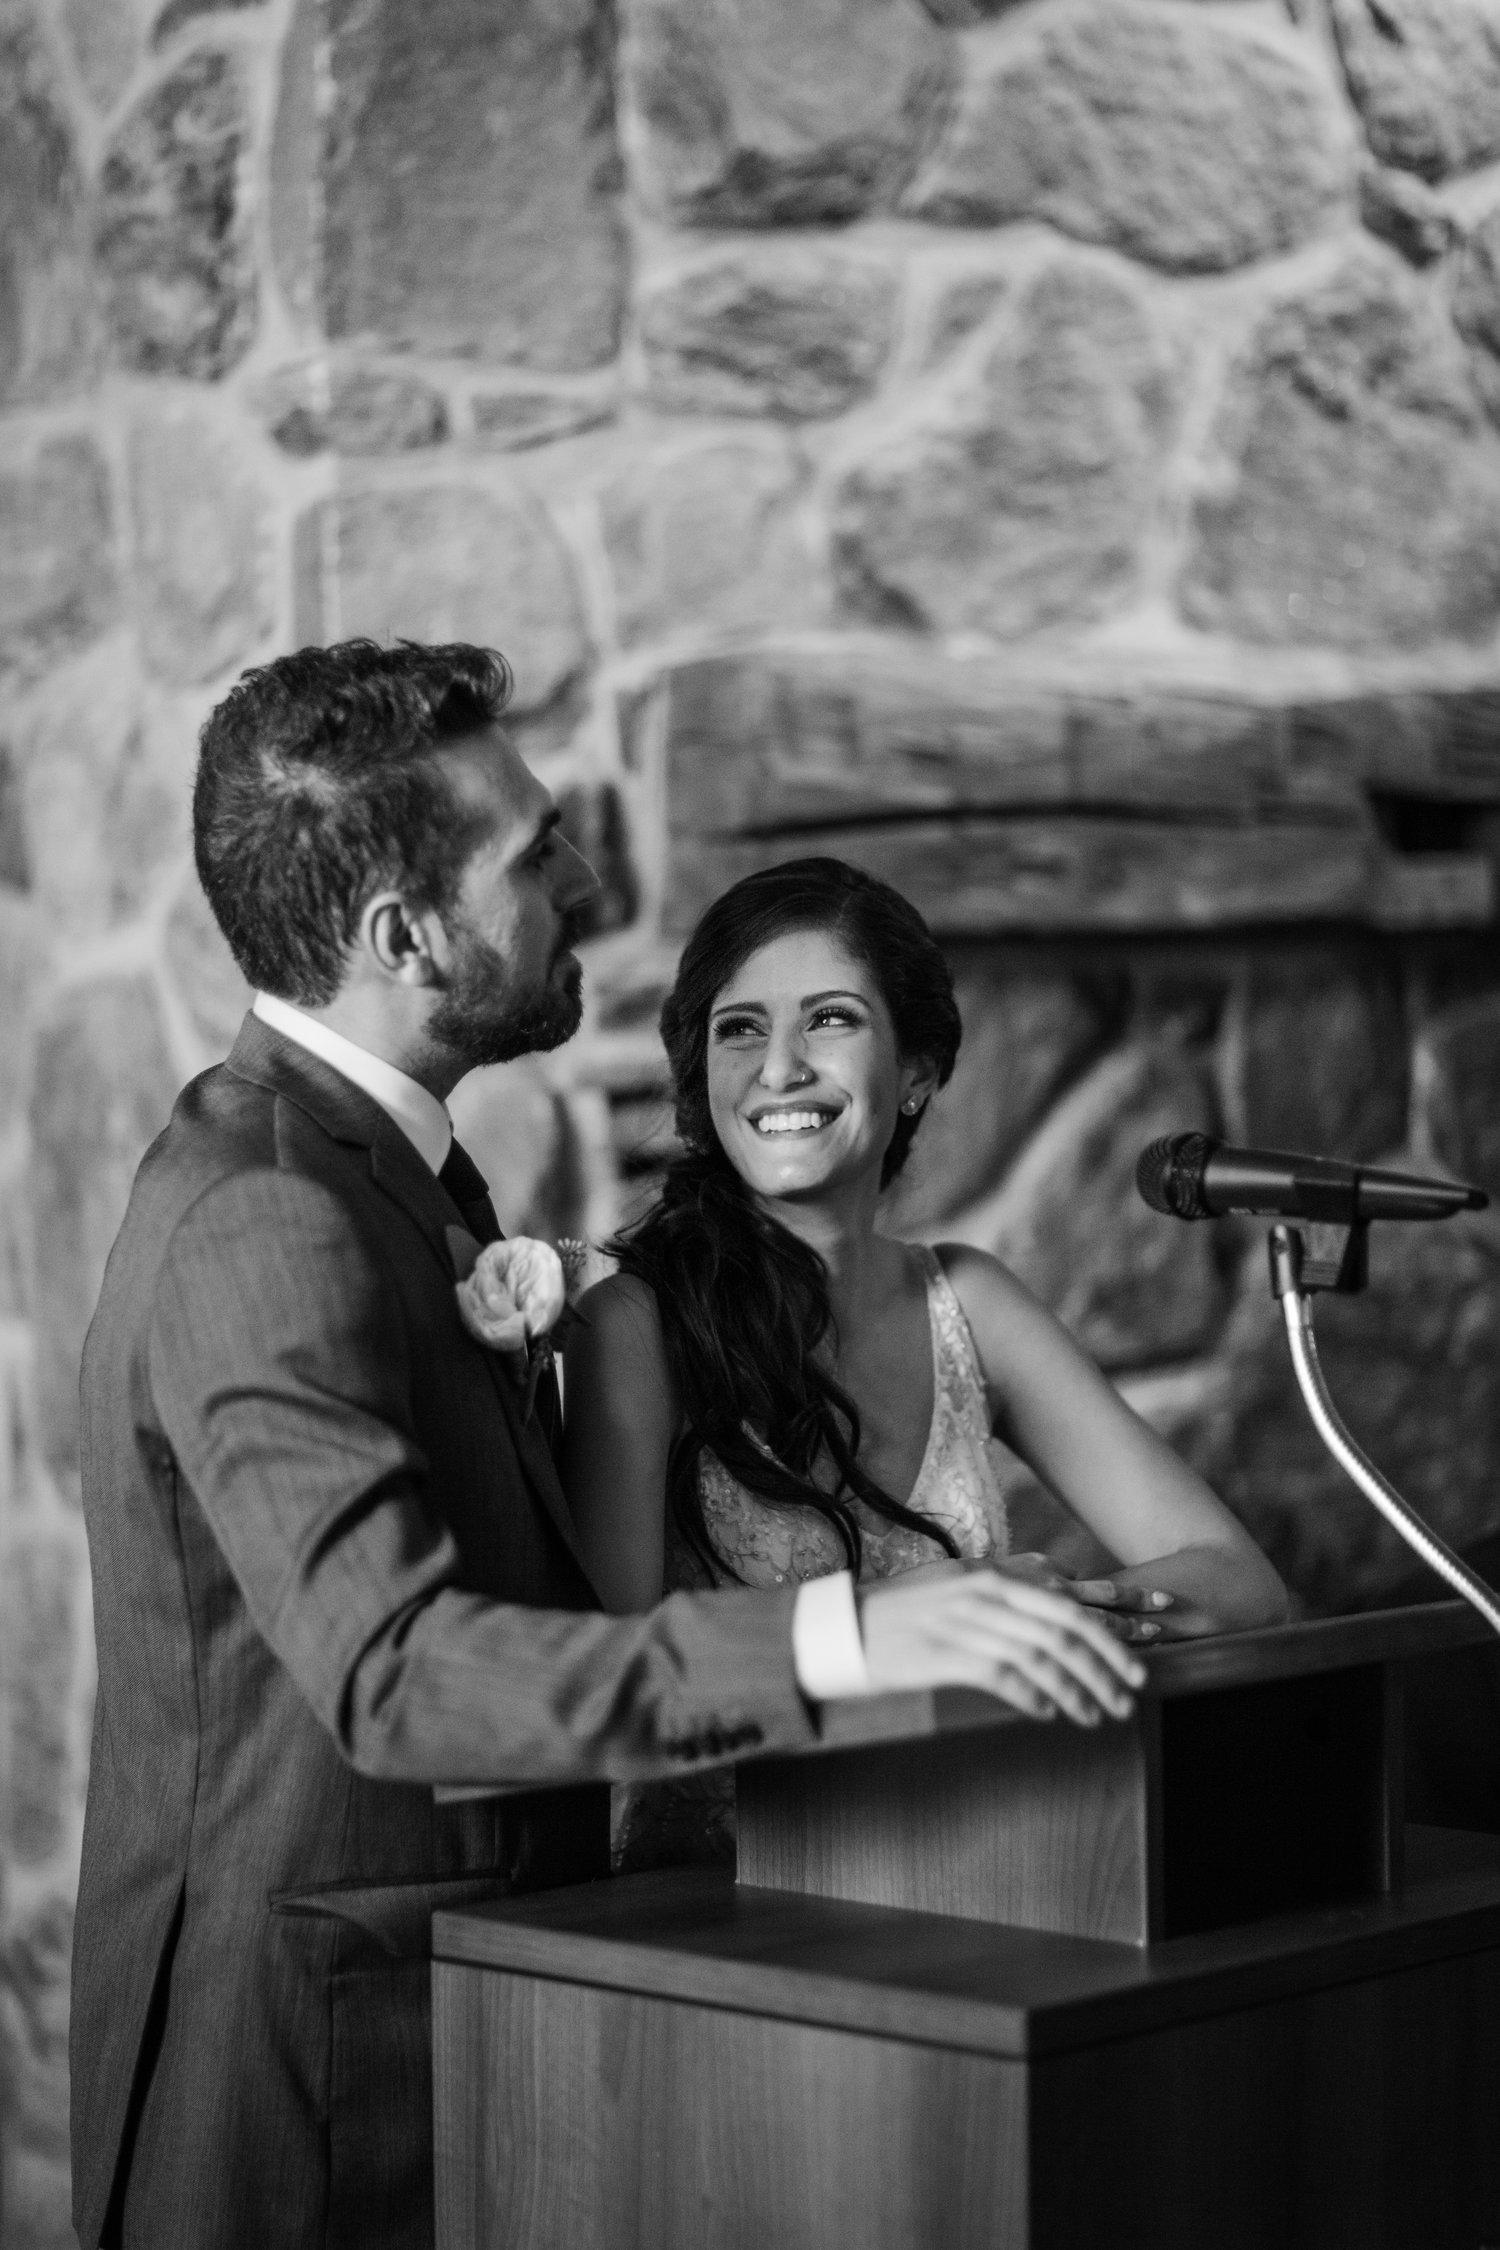 Amir-Golbazi-Danielle-Giroux-Photography_Toronto-Wedding_Cedarwood_Rachel-Paul_718.jpg